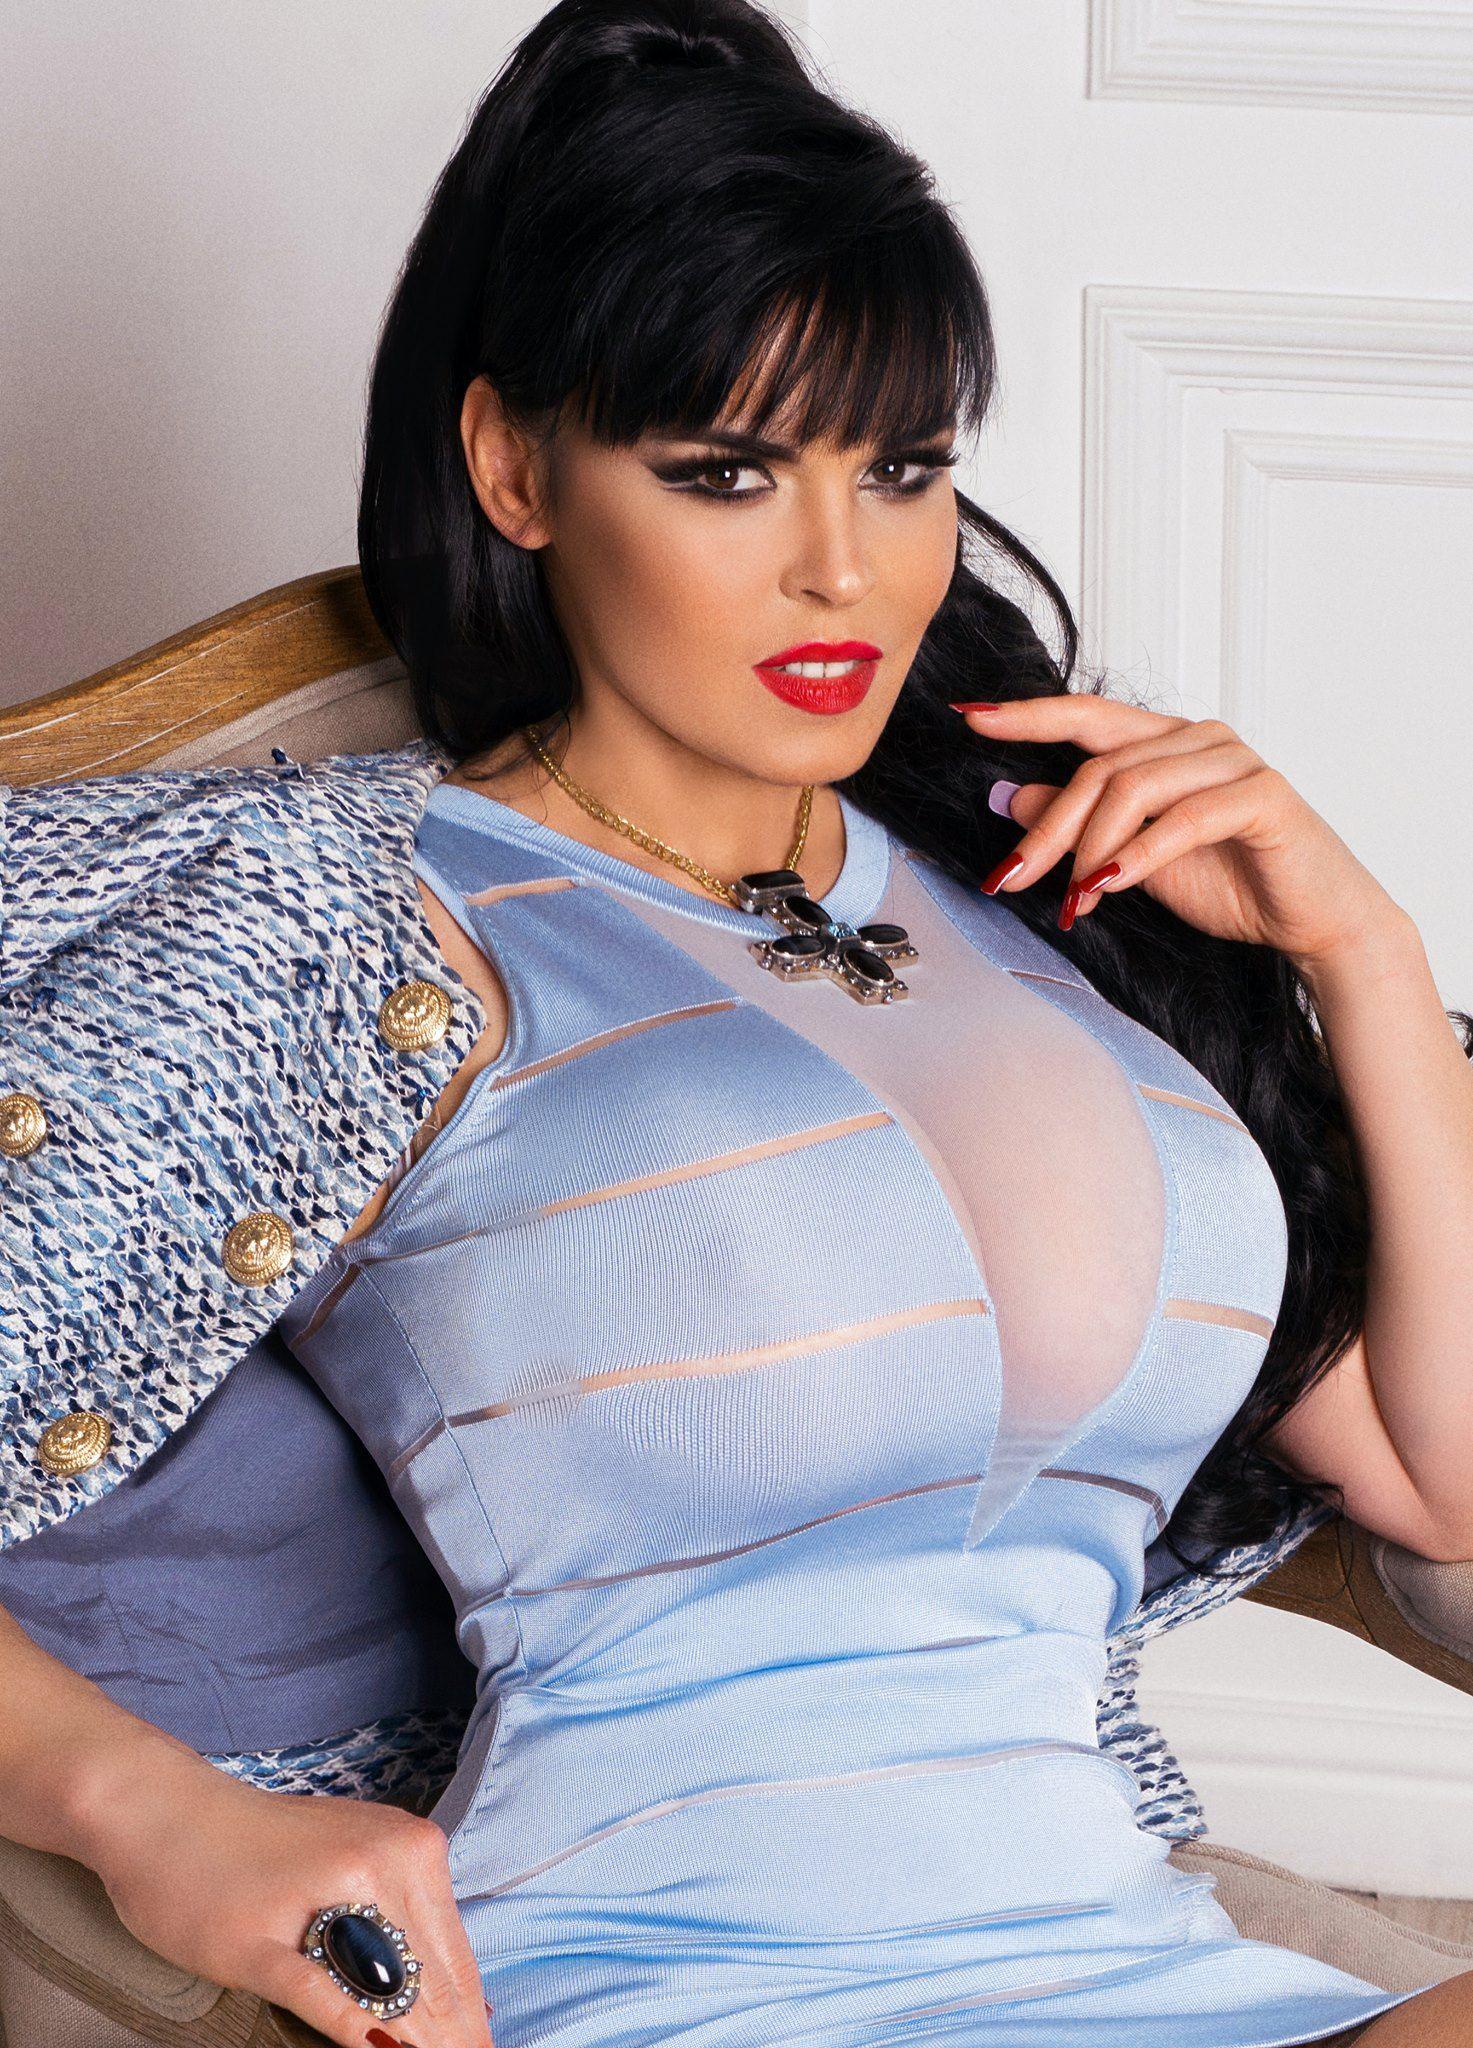 актер анна азерли биография проба пера